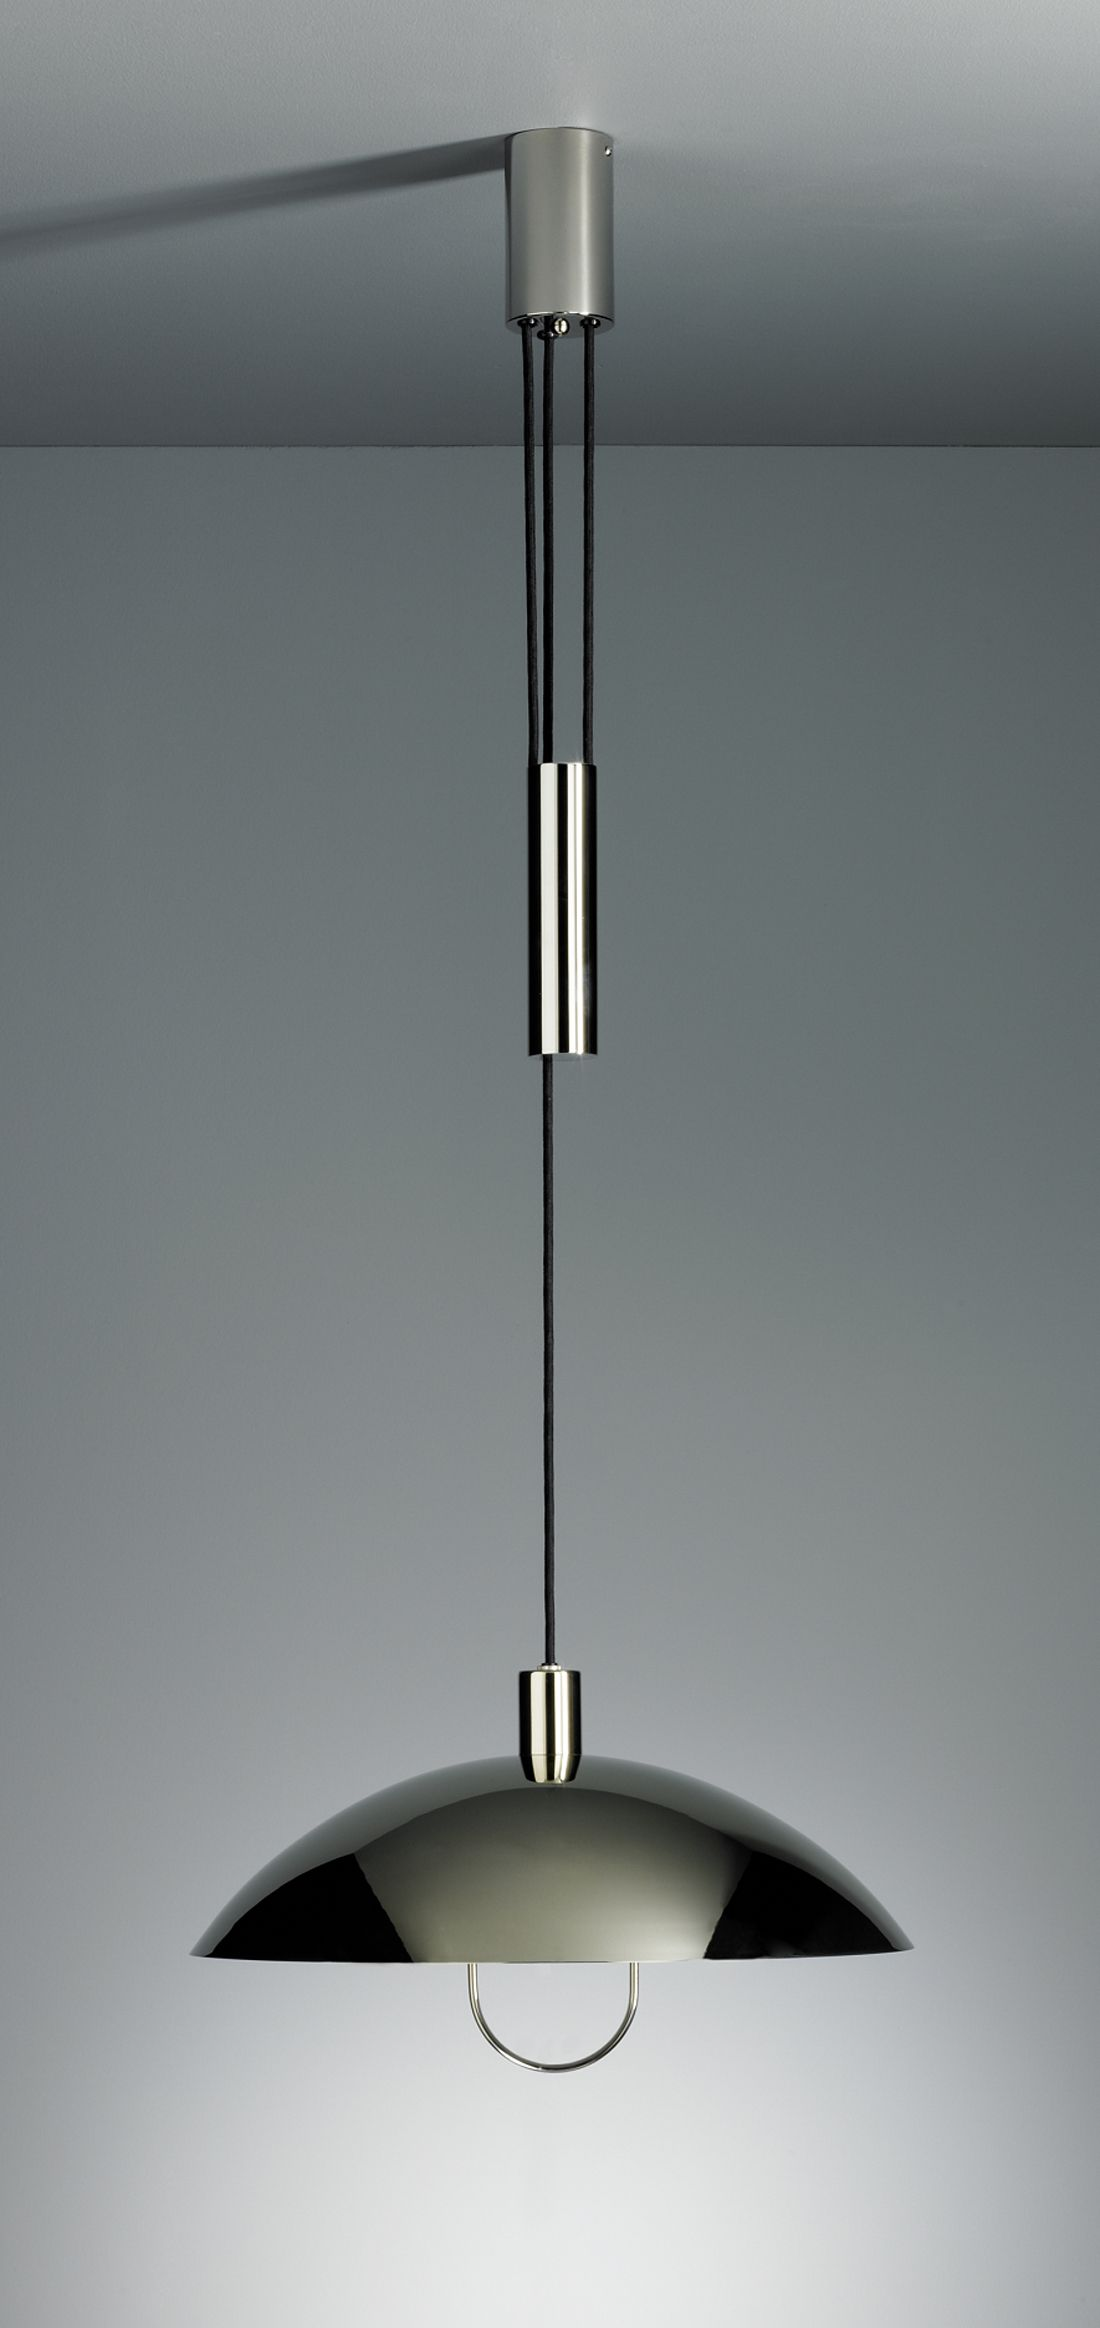 Ceiling Light | Marianne Brandt (1925) Pendulum Light ...